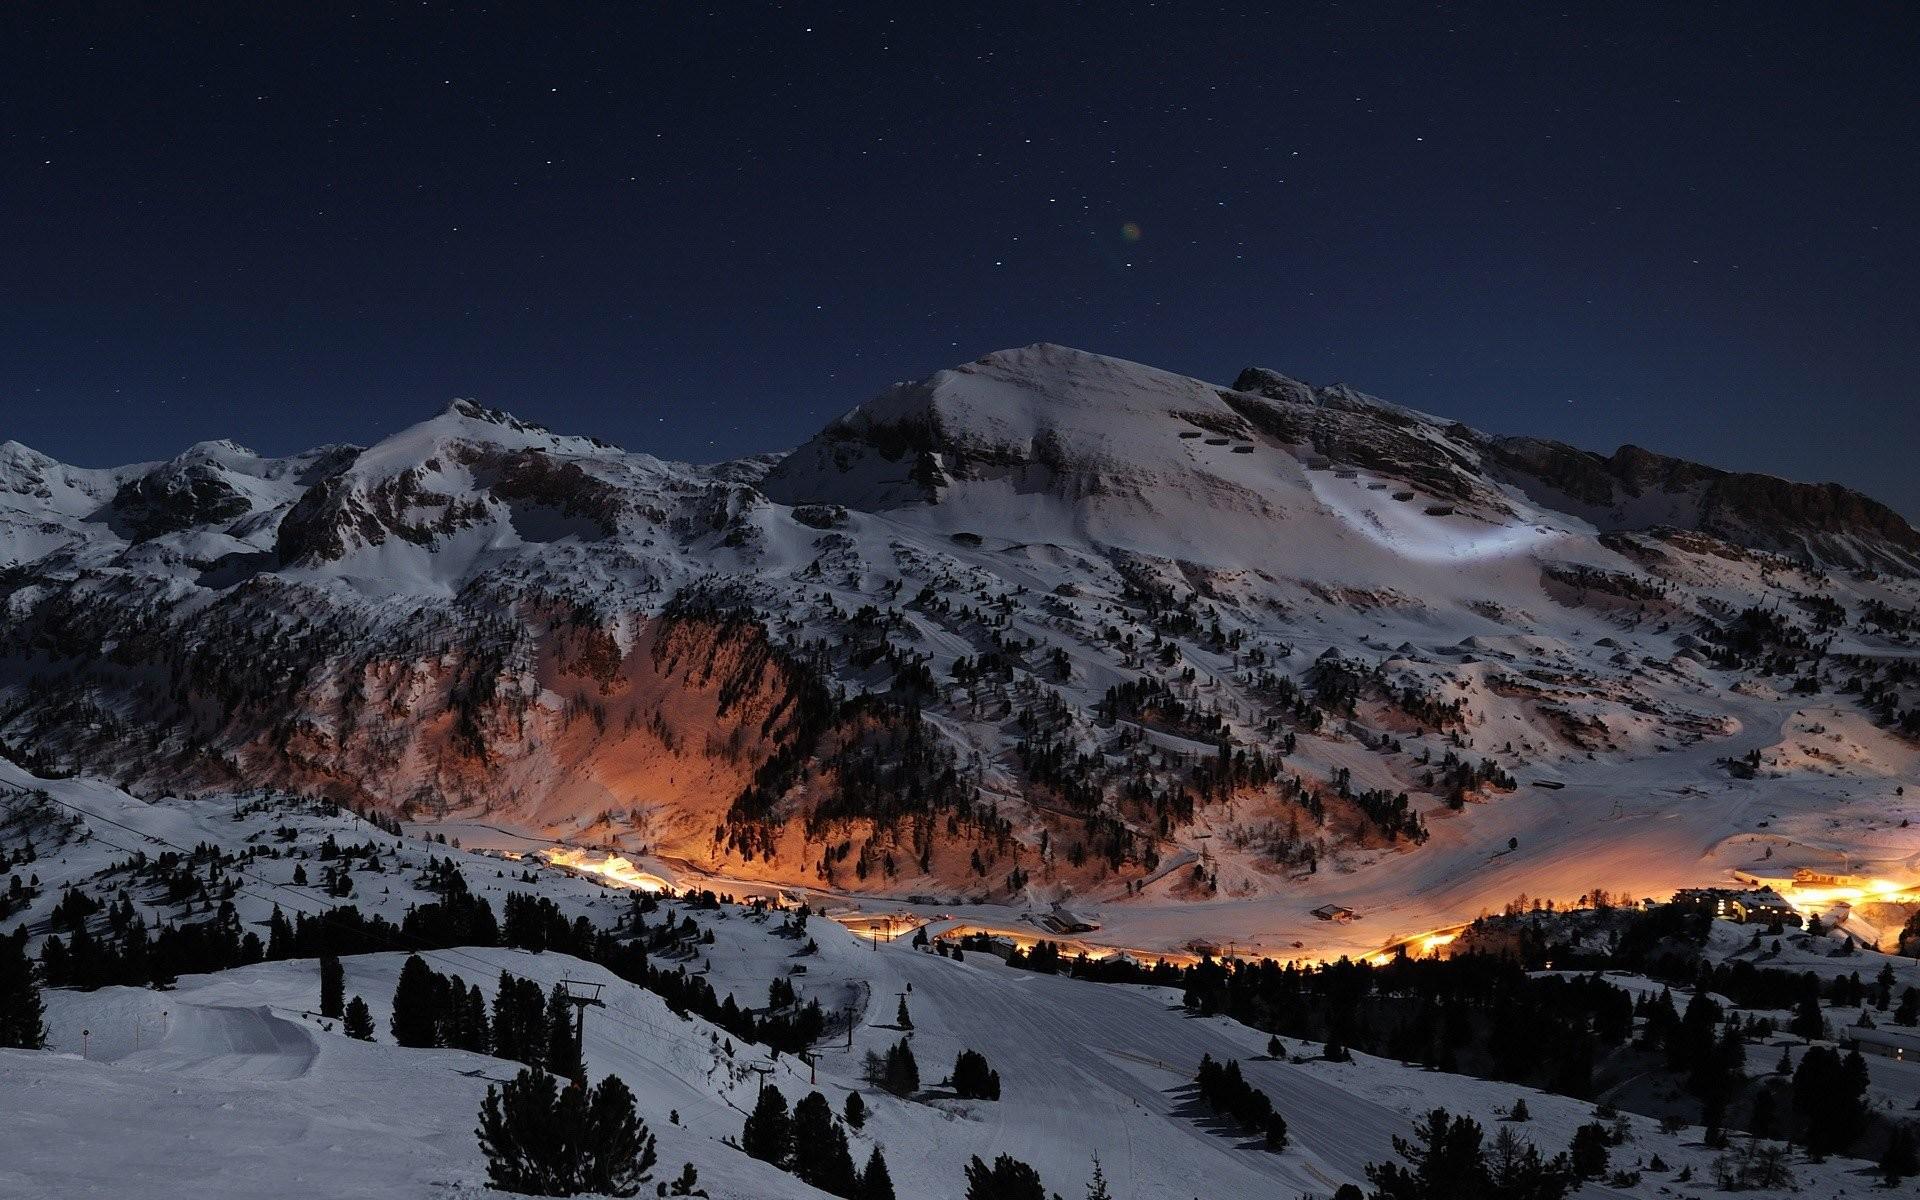 Snow Mountains Wallpaper Night